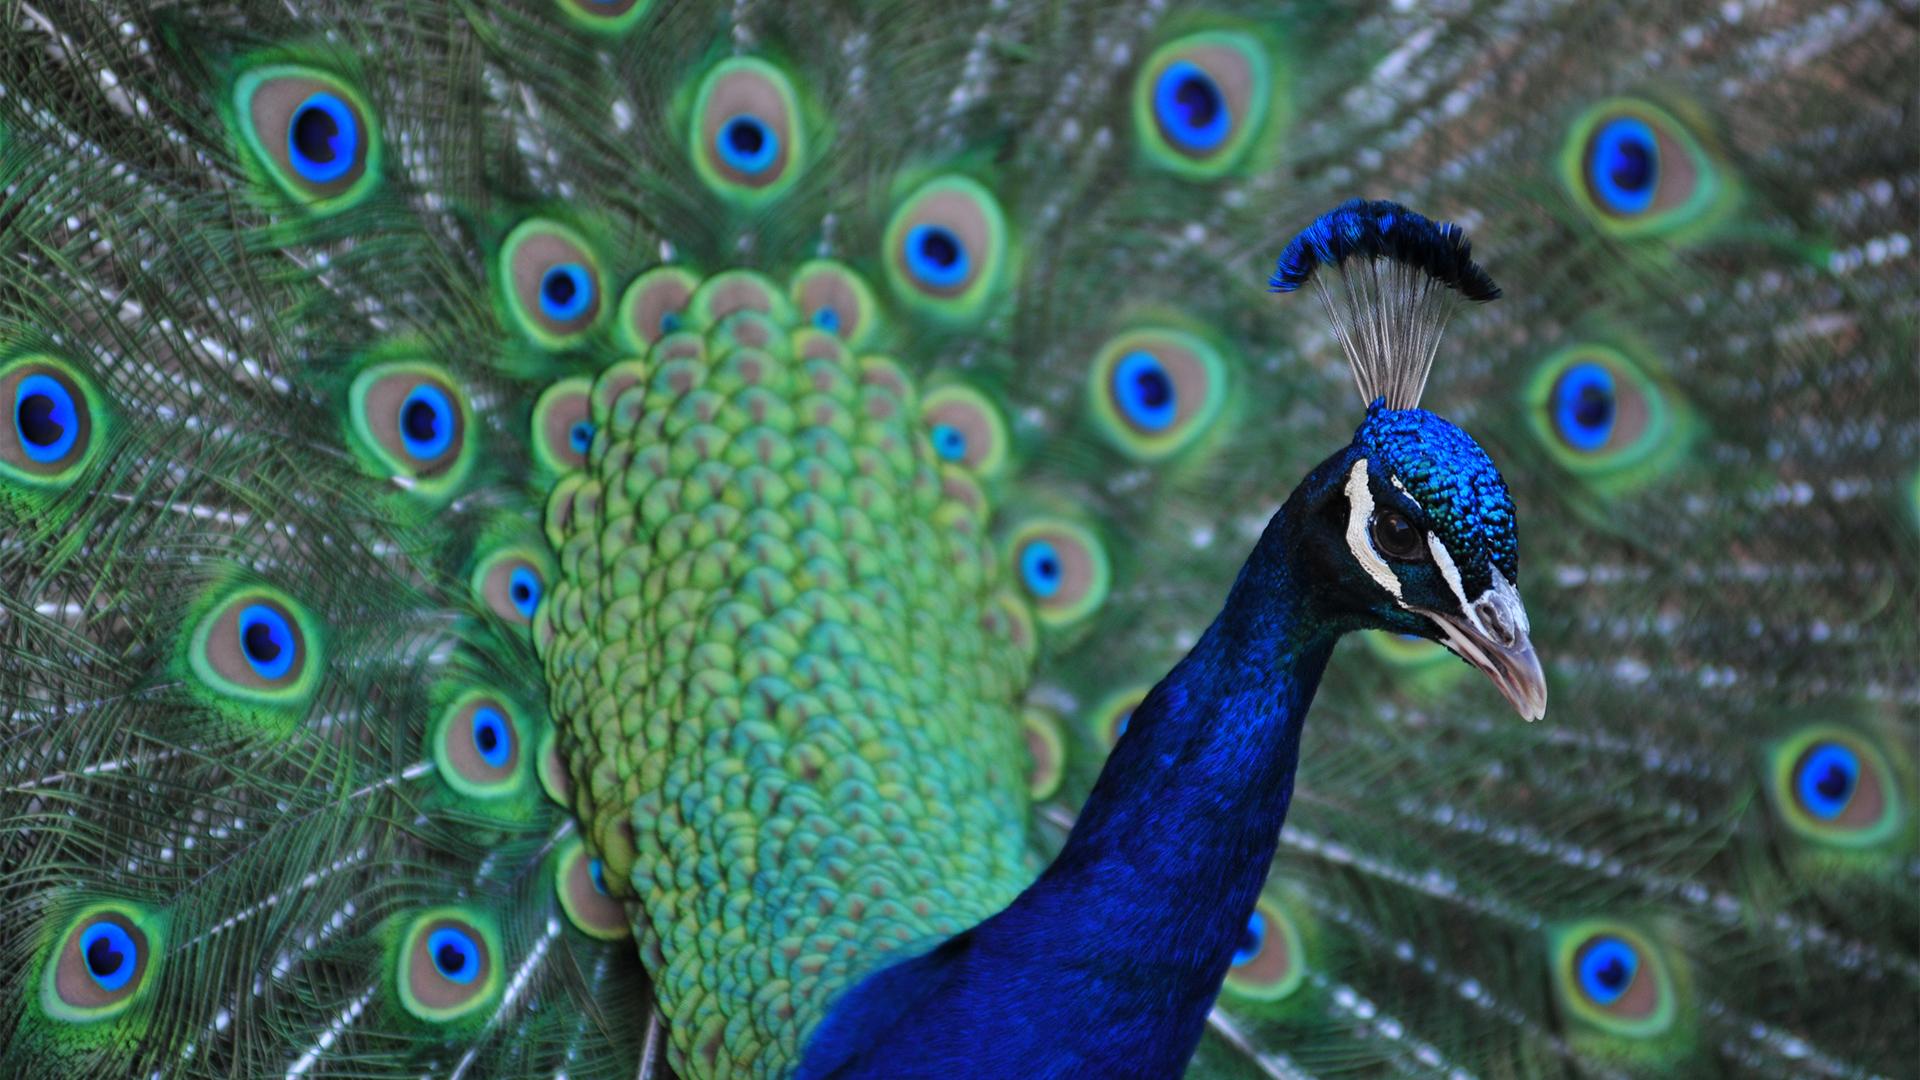 Peacock feathers at Lake Tobias Wildlife Park